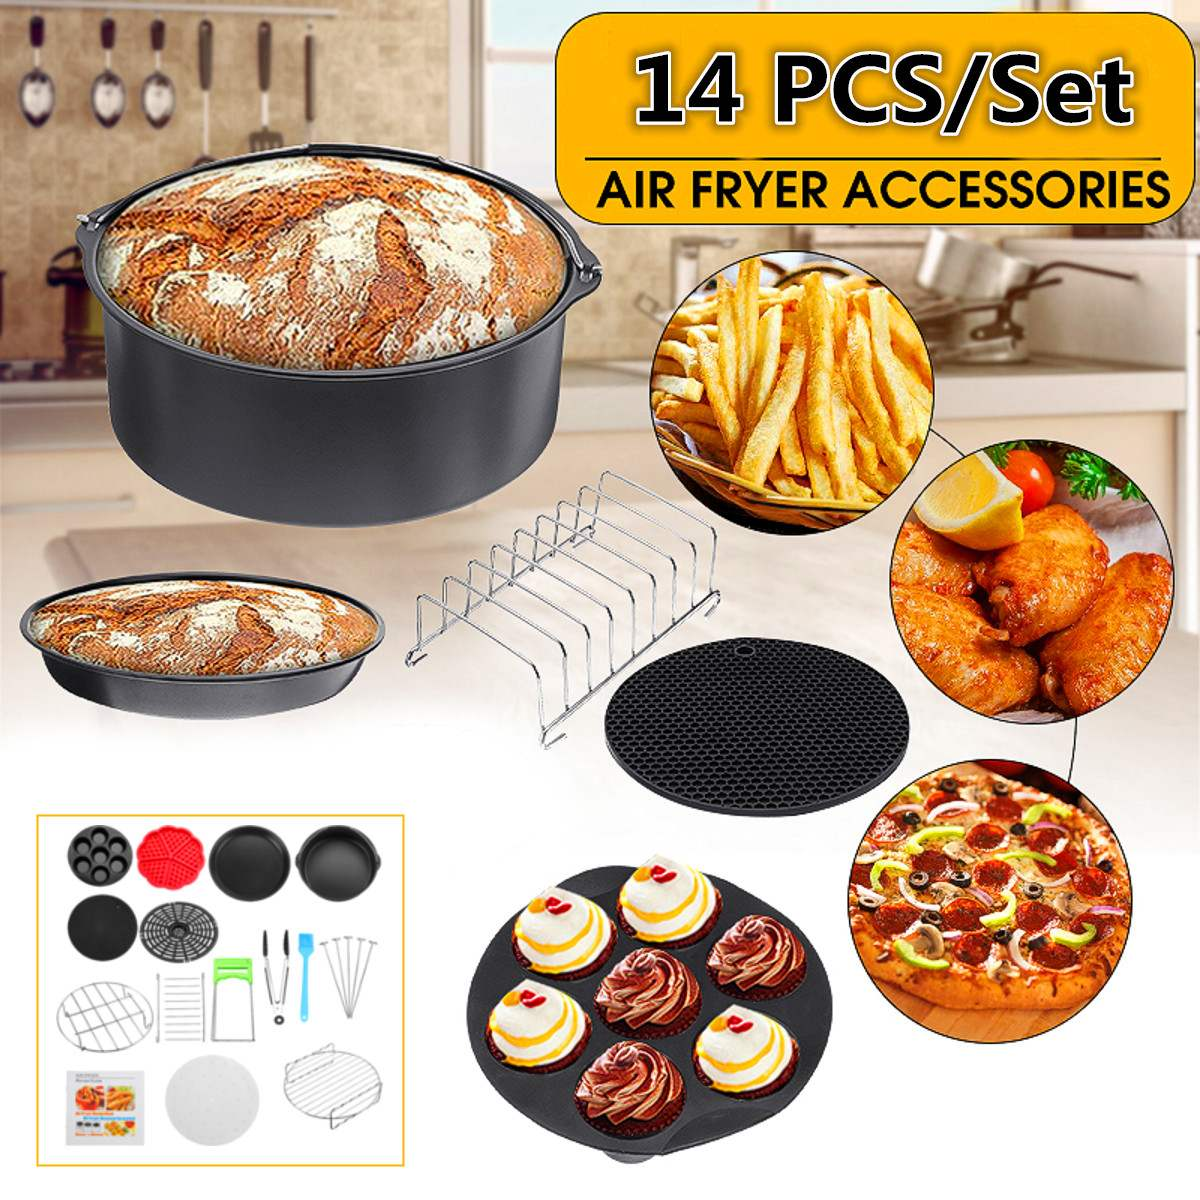 14pc/set High Quality Air Fryer Accessories Fit Air Fryer 5.3QT To 6.8QT Universal Deep Fryer Cake Barrel Pizza Pan Mat Skewer